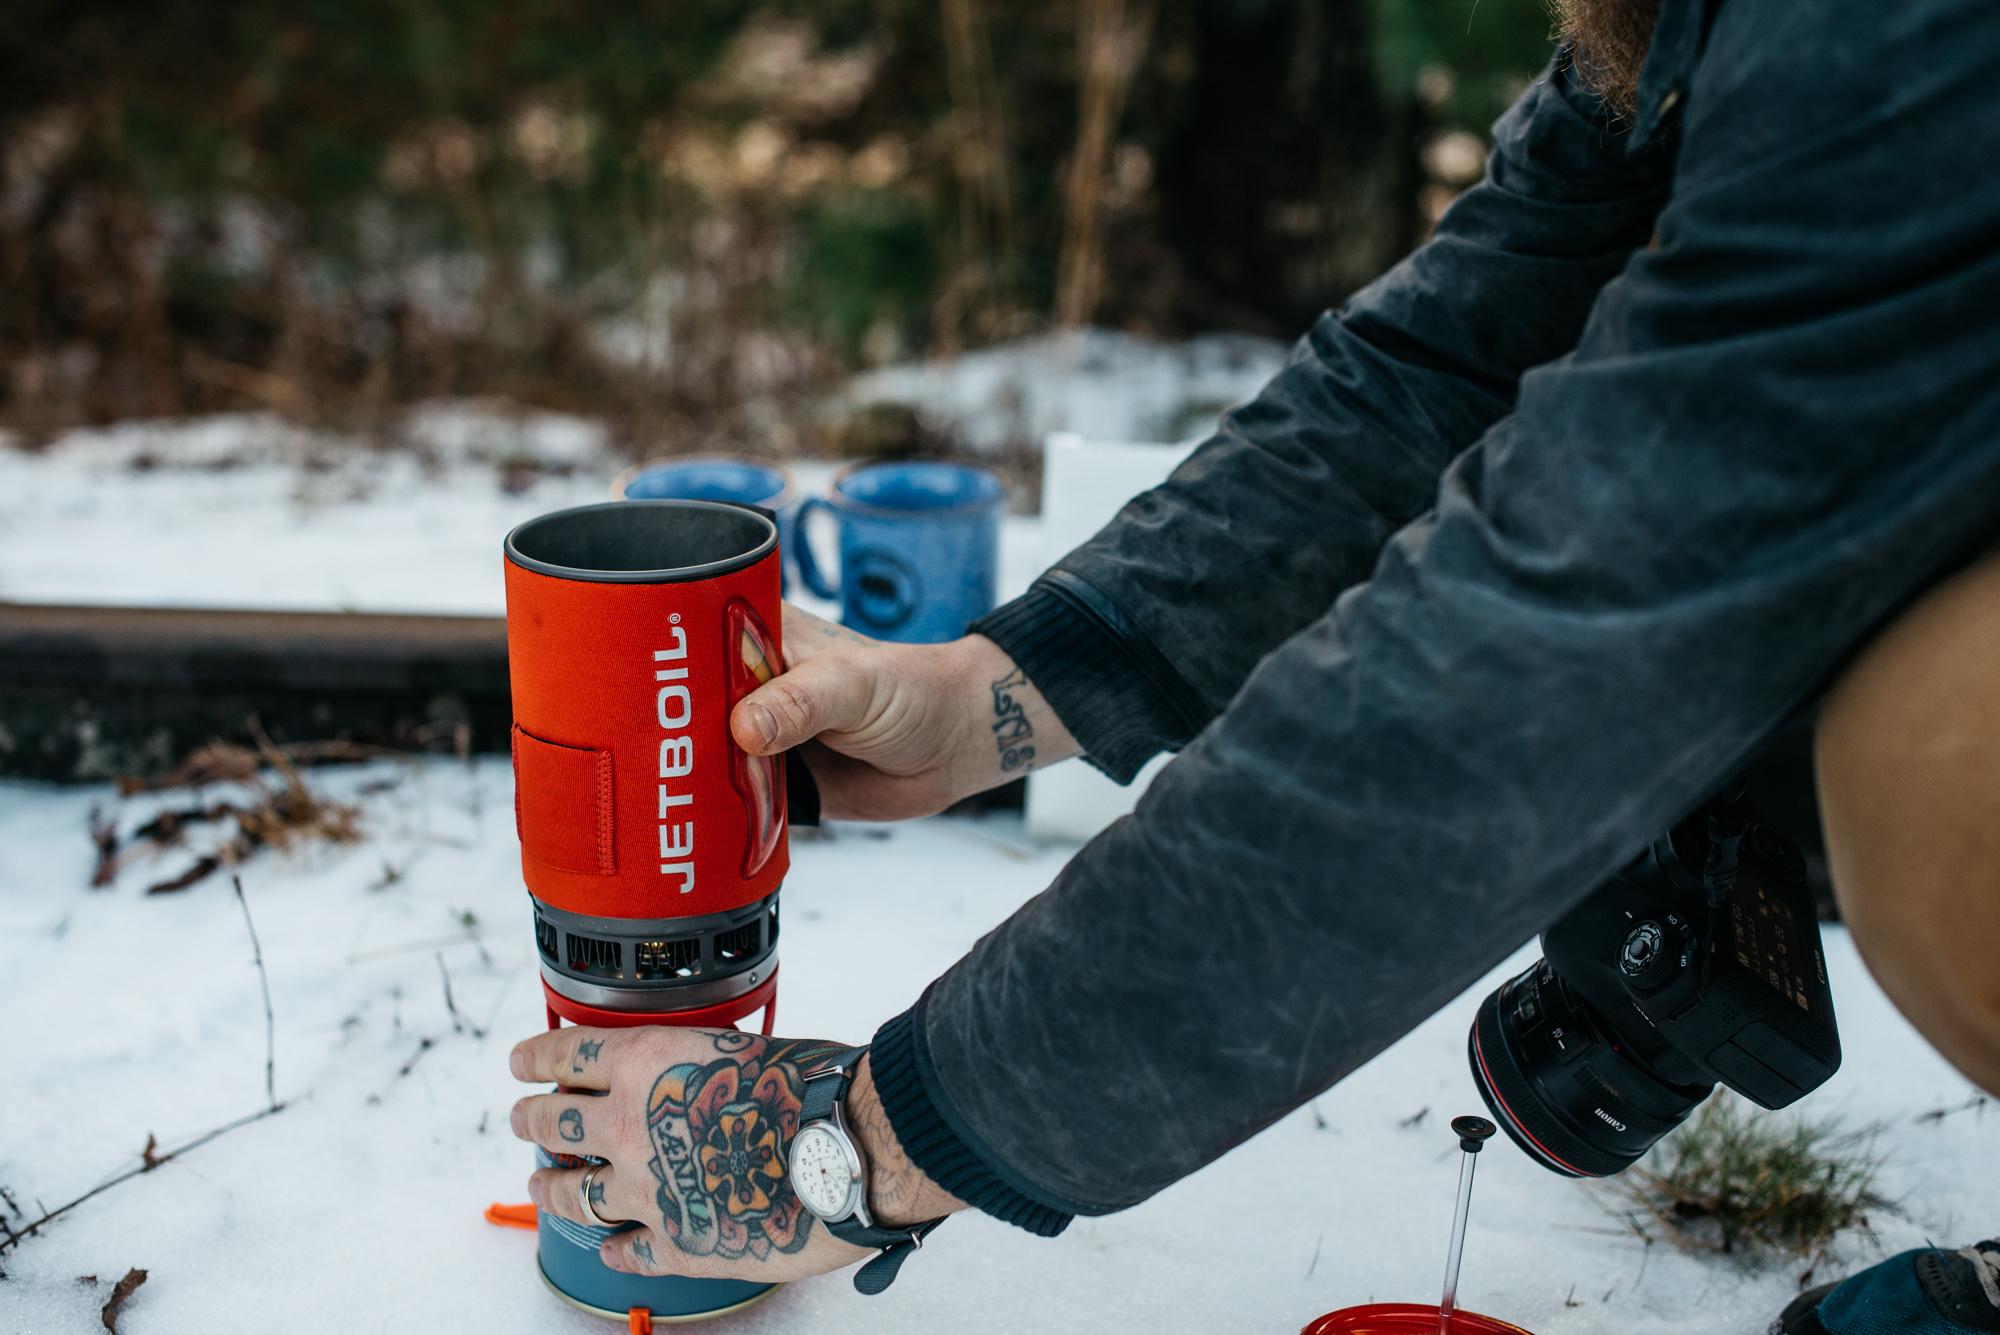 coffee-by-the-tracks-catskills-nye-lawrence-braun-0022.jpg